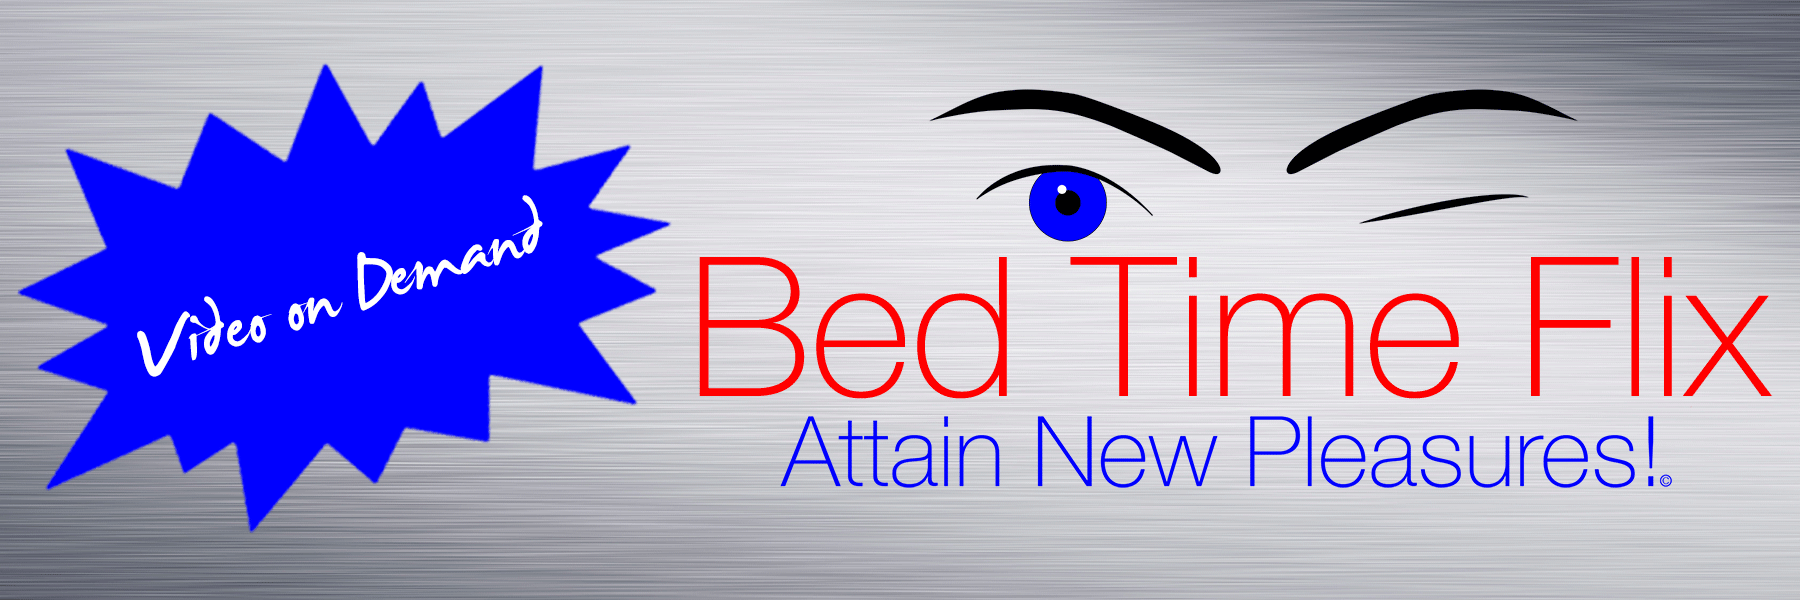 Bed Time Flix - xxx Video on Demand